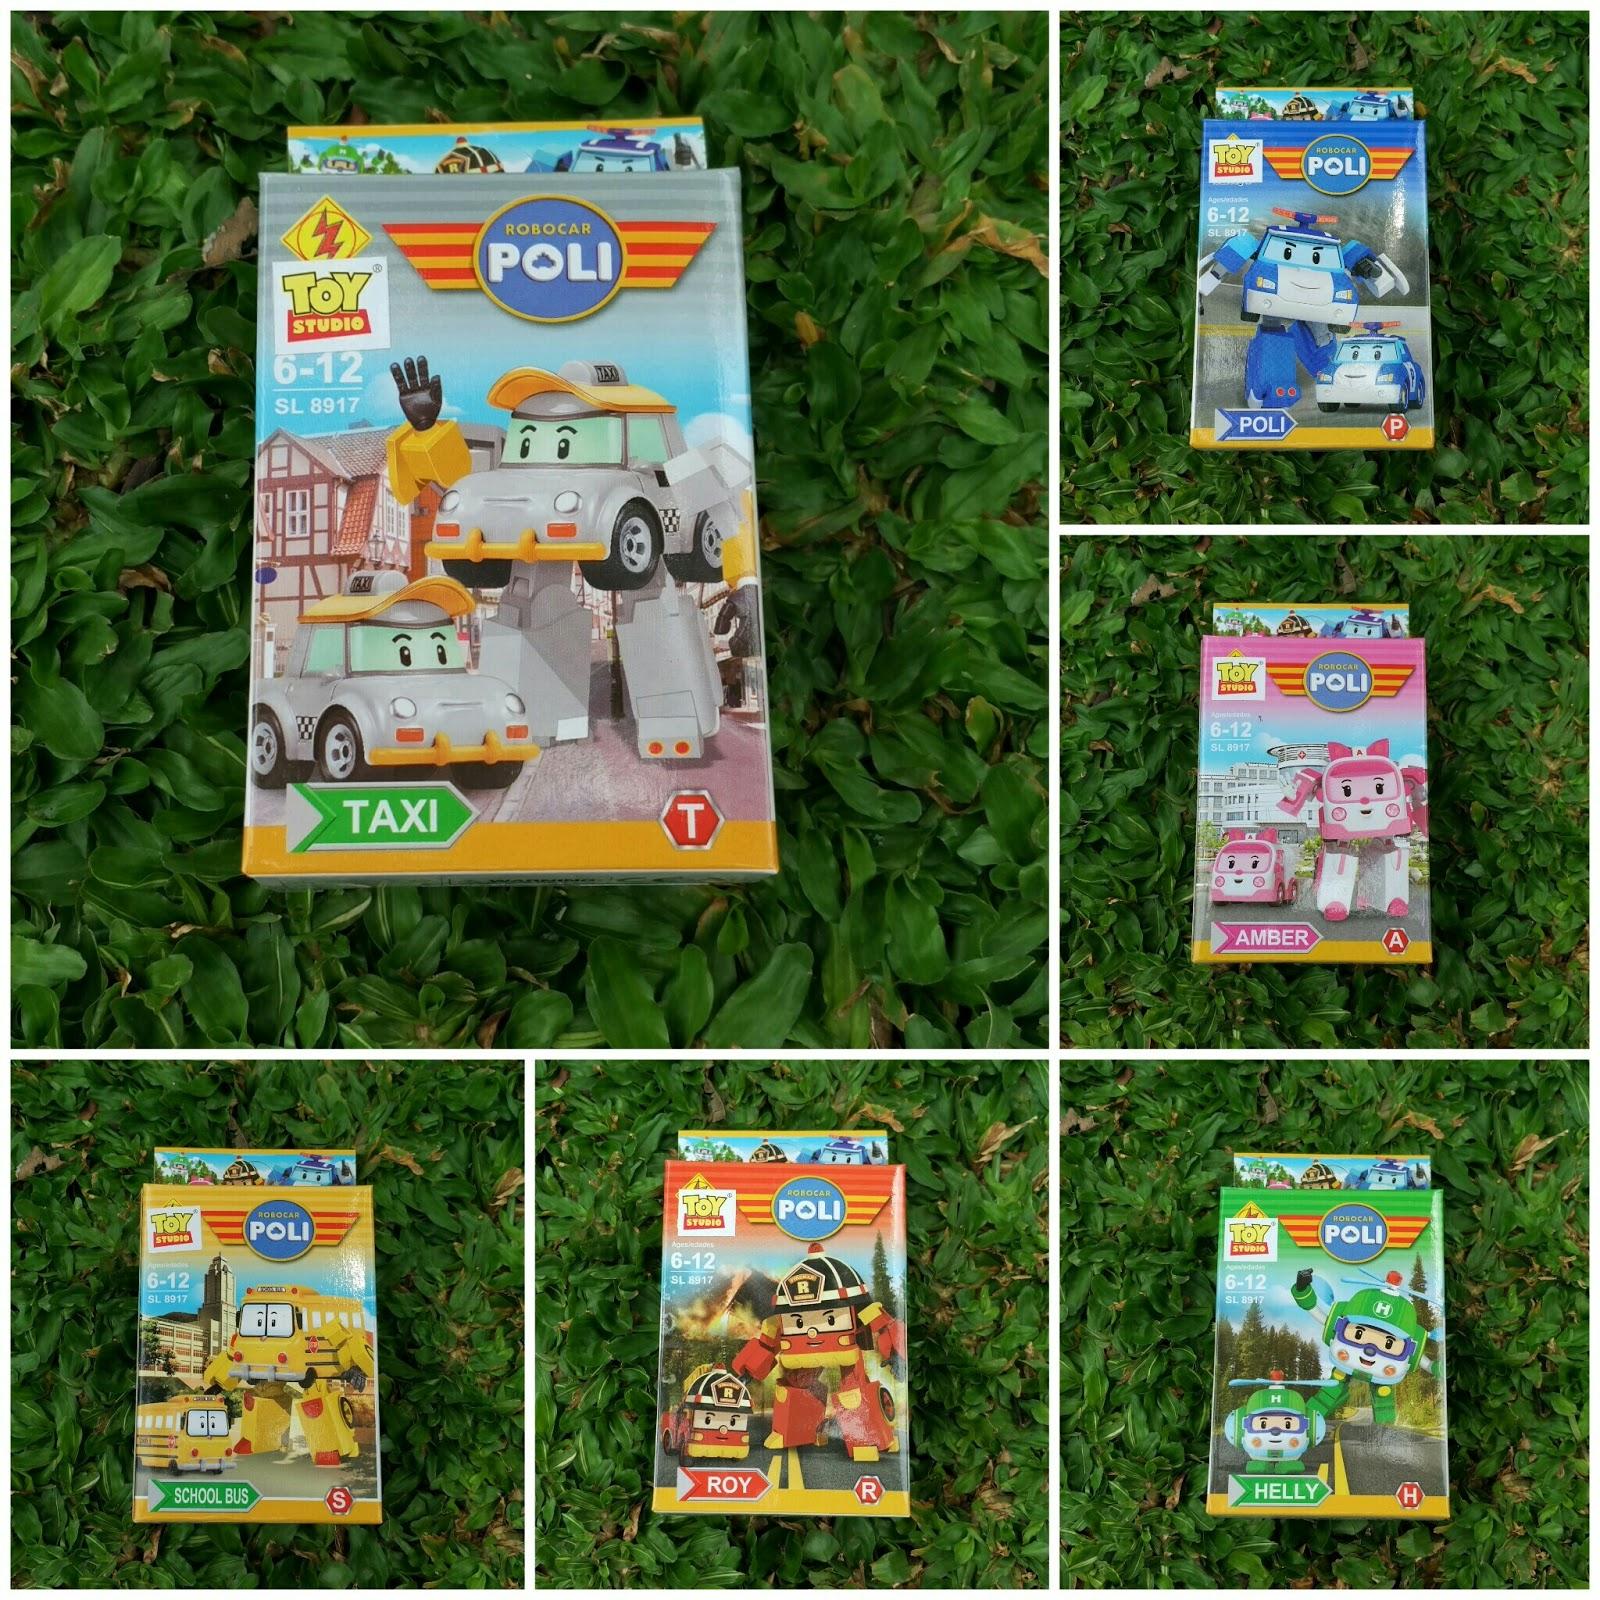 Lego Robo Car Poli Toy Studio, lego robo poli, lego robo car poli, toy studio robo car poli, mainan robo car poli, mainan lego, lego for boys, mainan toy studio, mainan robo poli, mainan anak